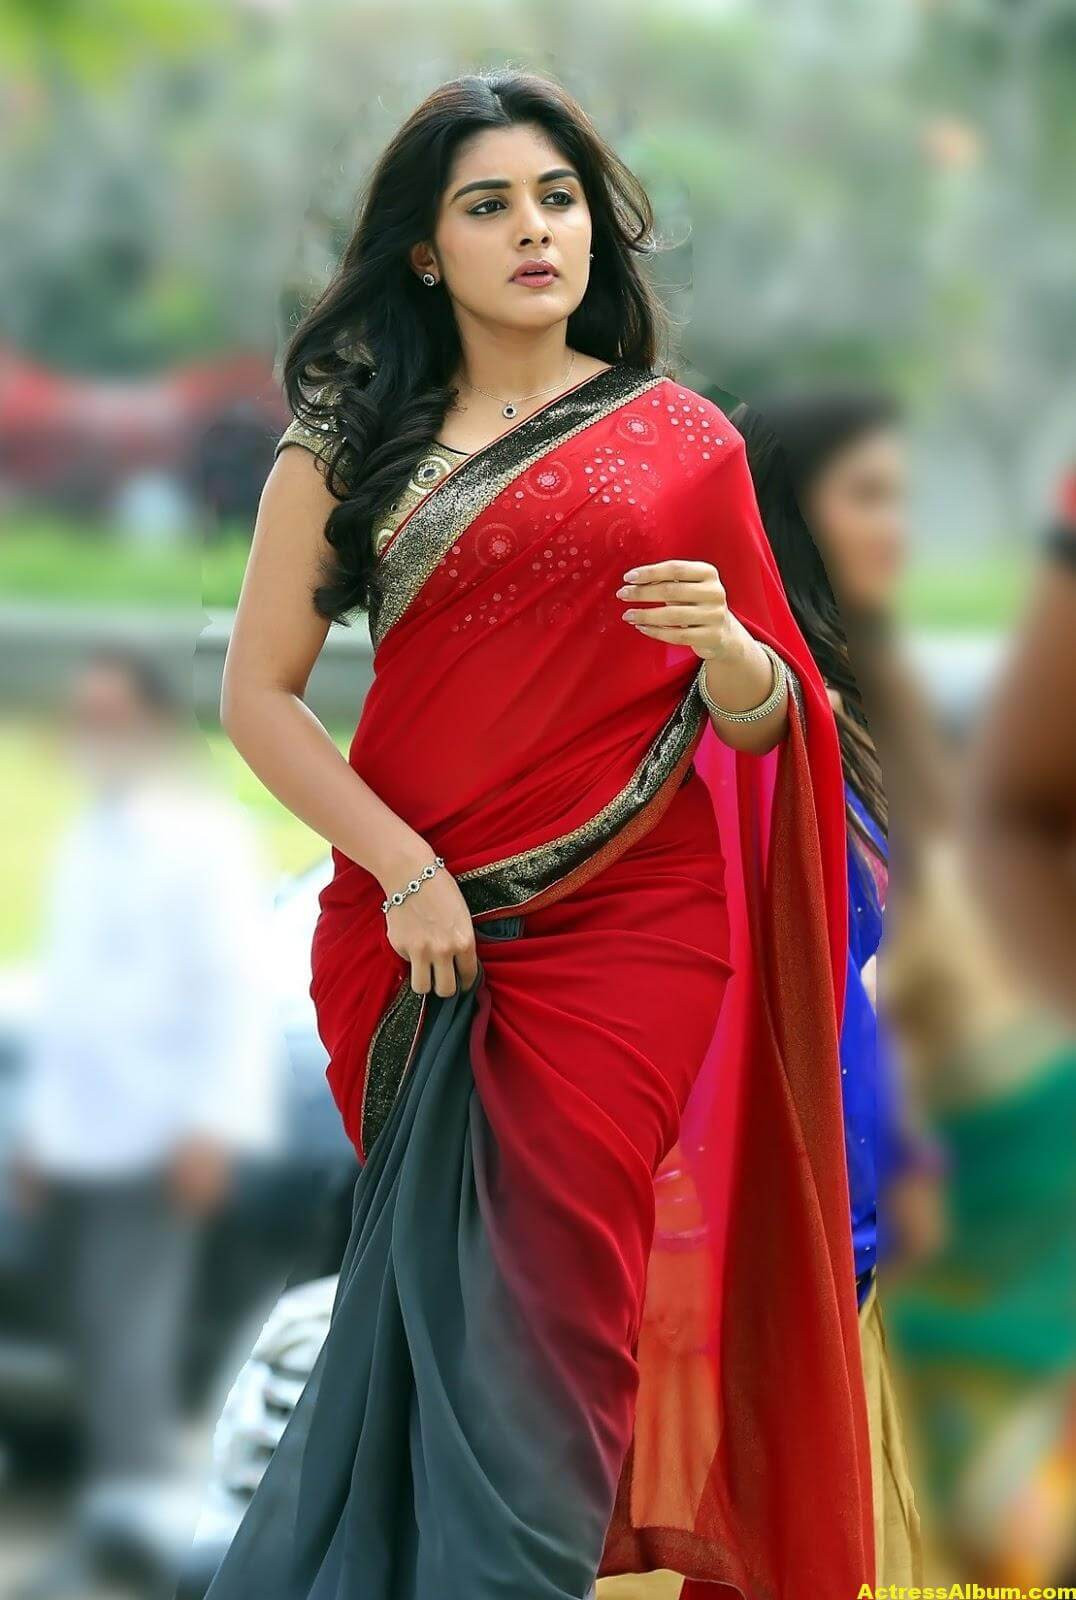 Niveda Thomas Photos In Red Saree - Actress Album